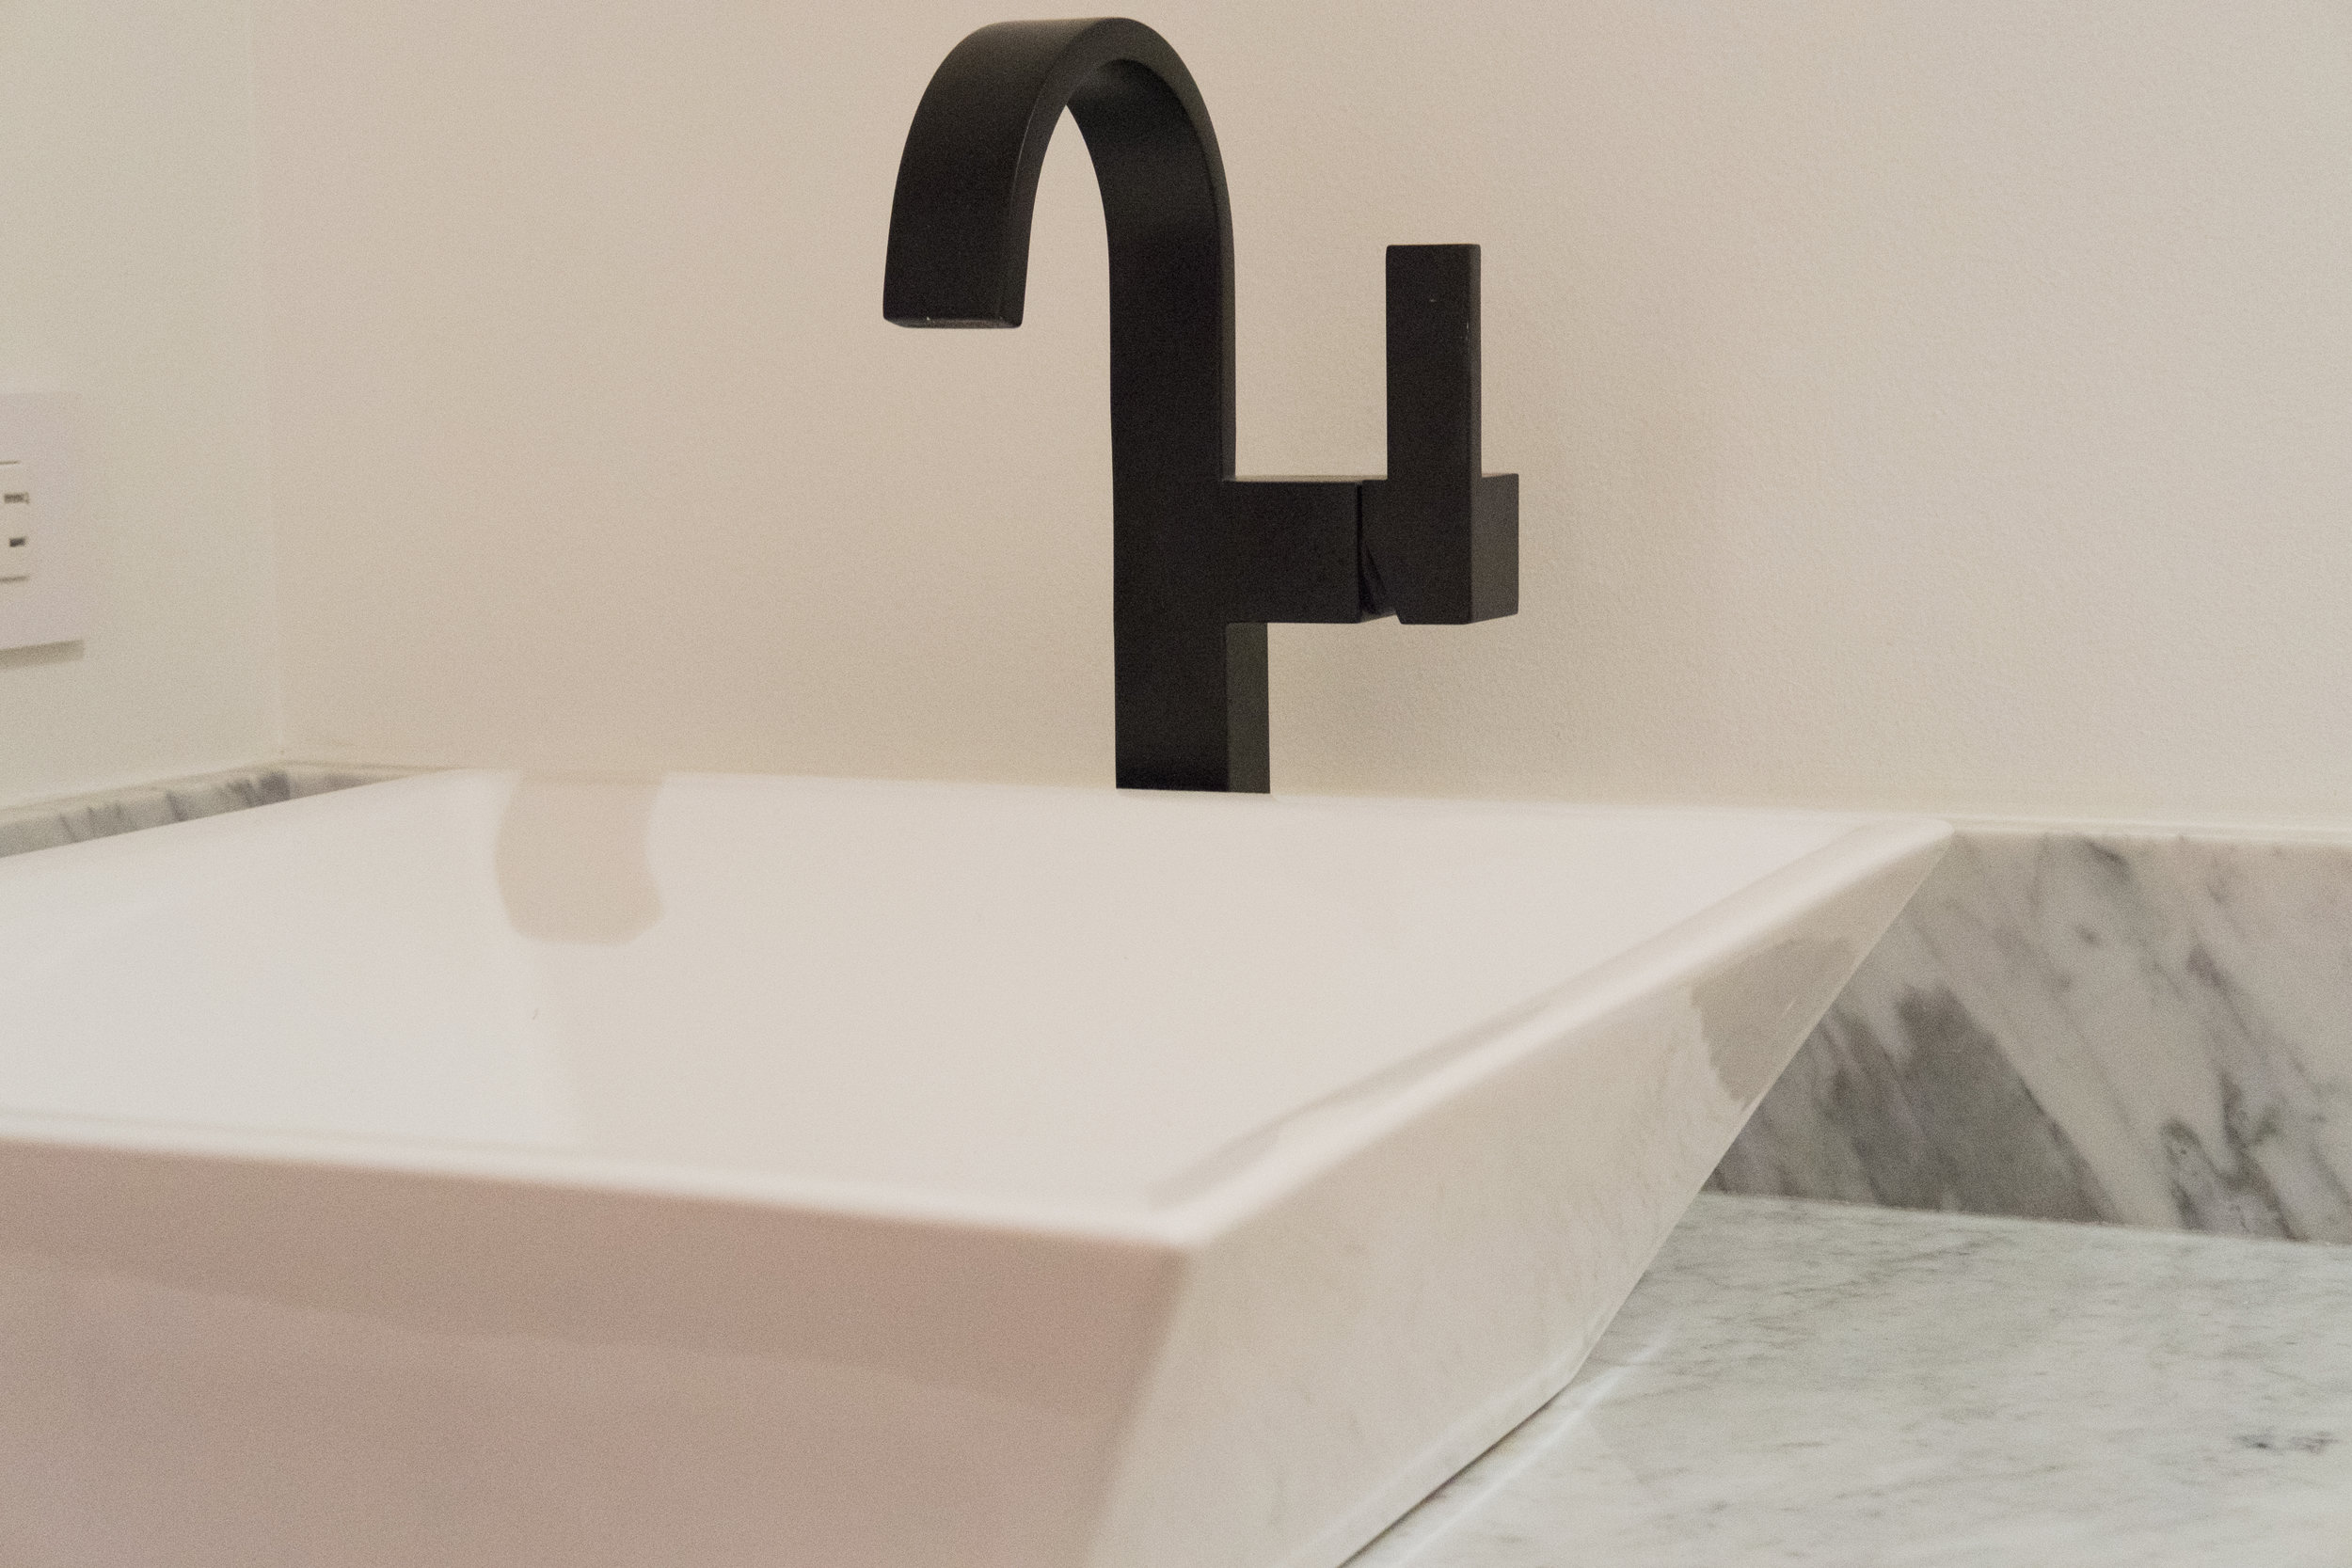 BathSinkClose1.jpg